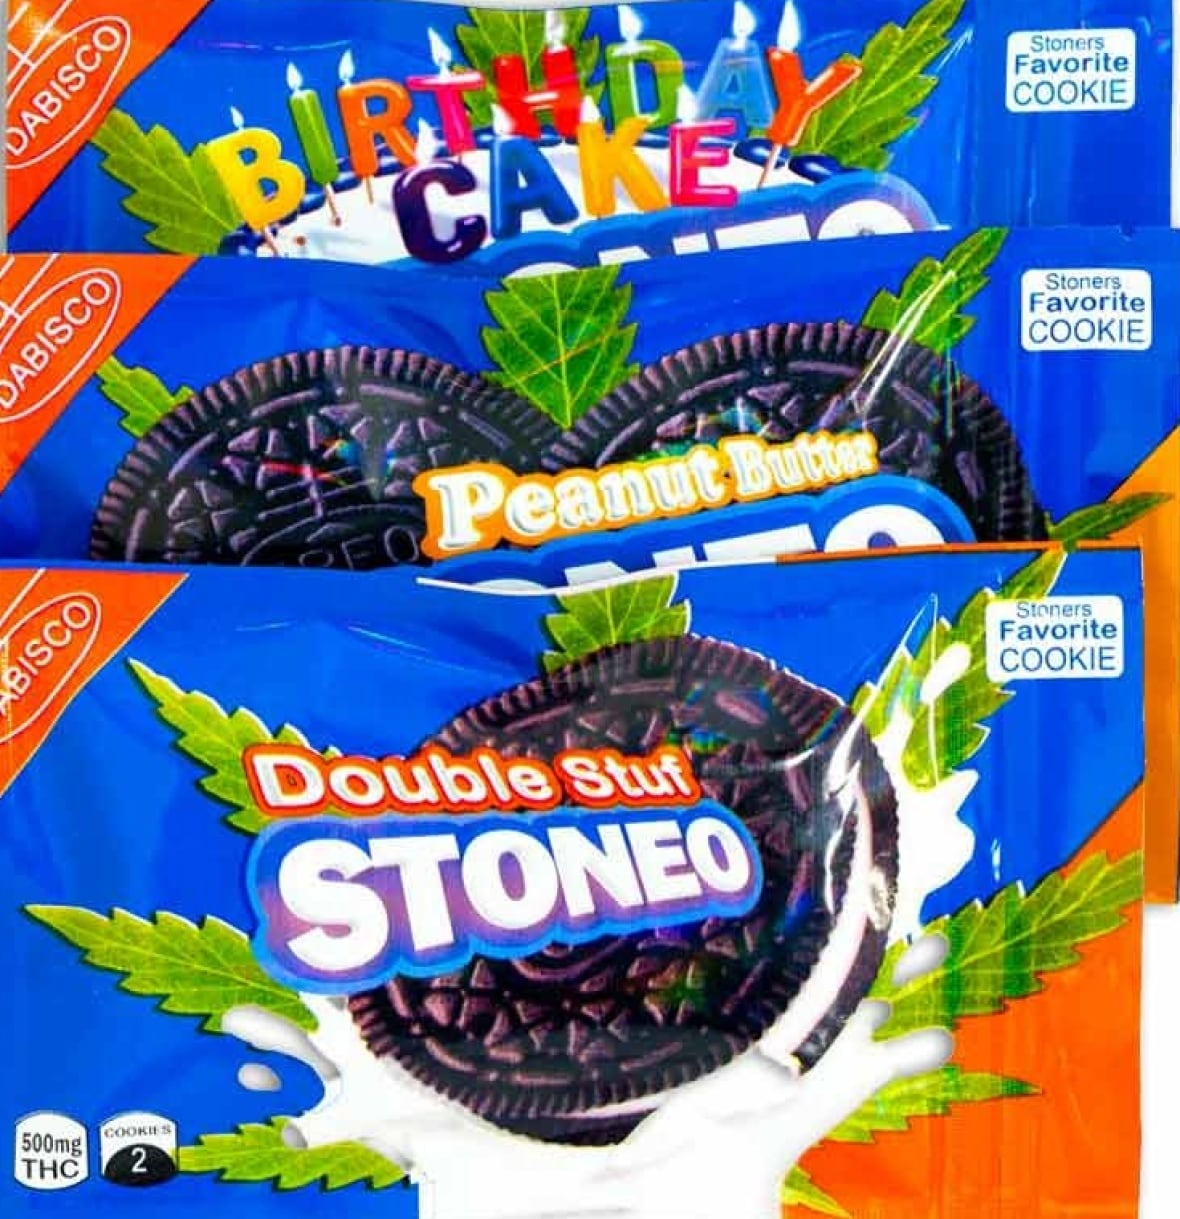 https://i.cbc.ca/1.6021040.1620746725!/fileImage/httpImage/image.jpg_gen/derivatives/original_1180/stoneo-cookies.jpg